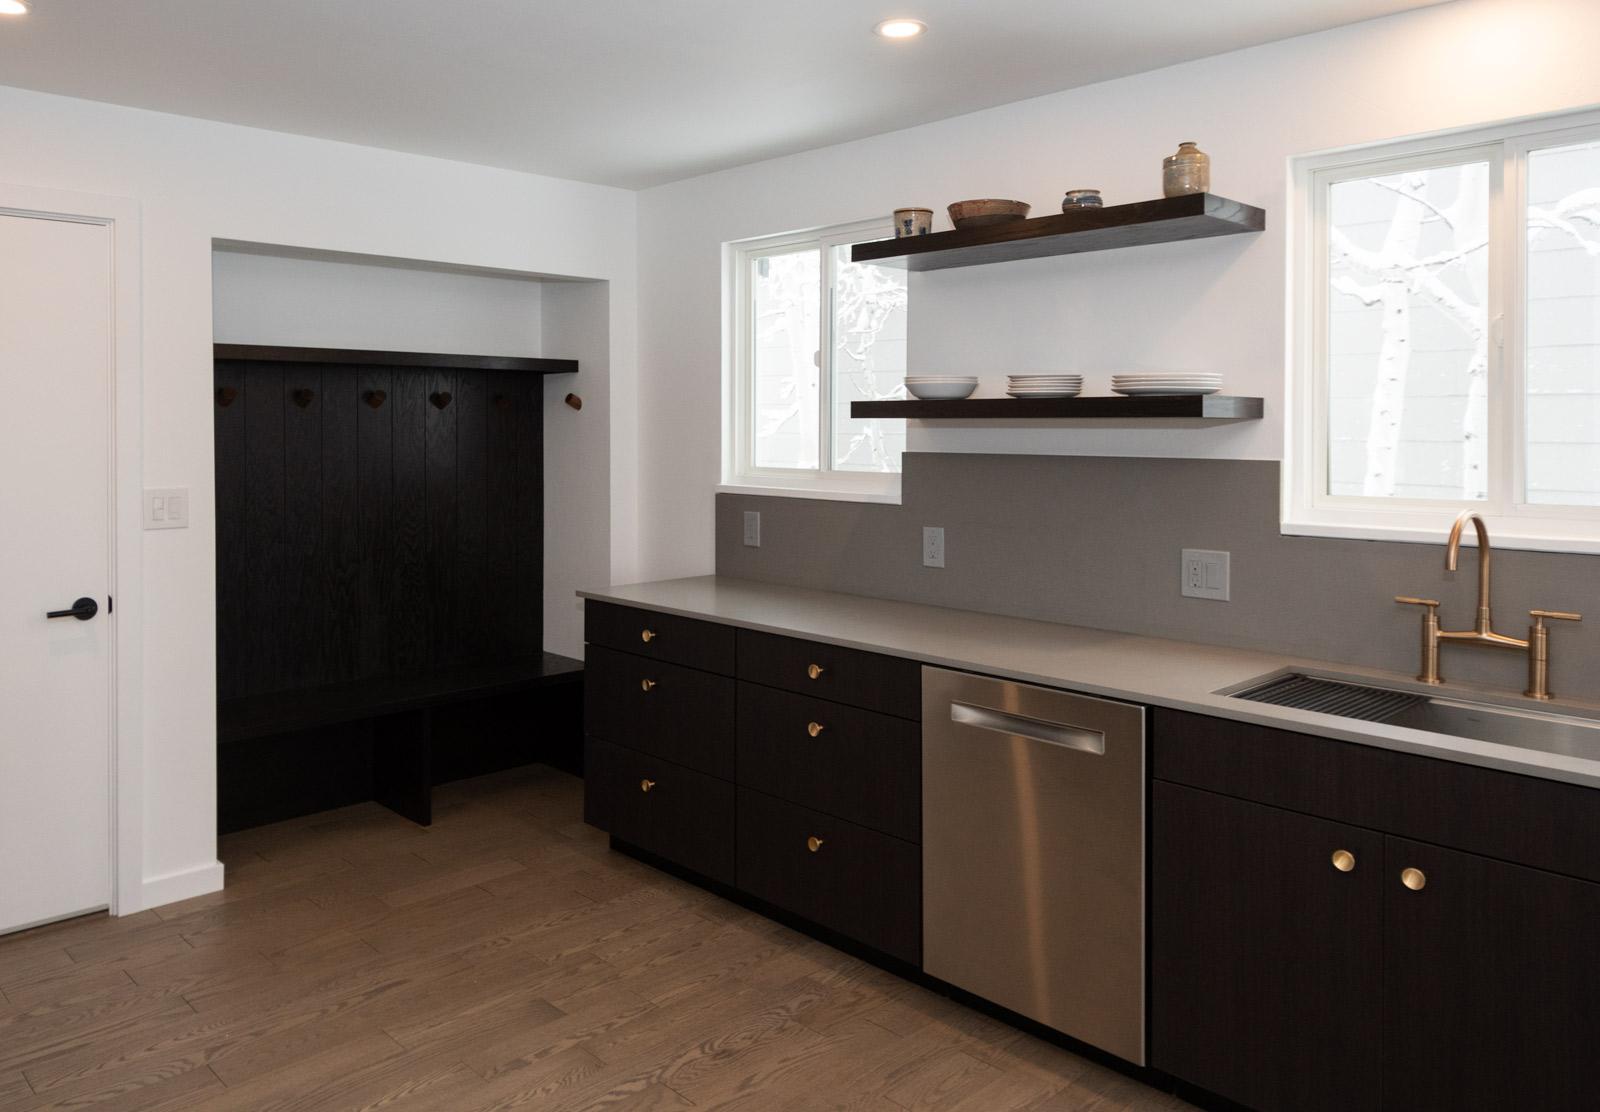 7810 durham way kitchen cabinets shelves nook overview